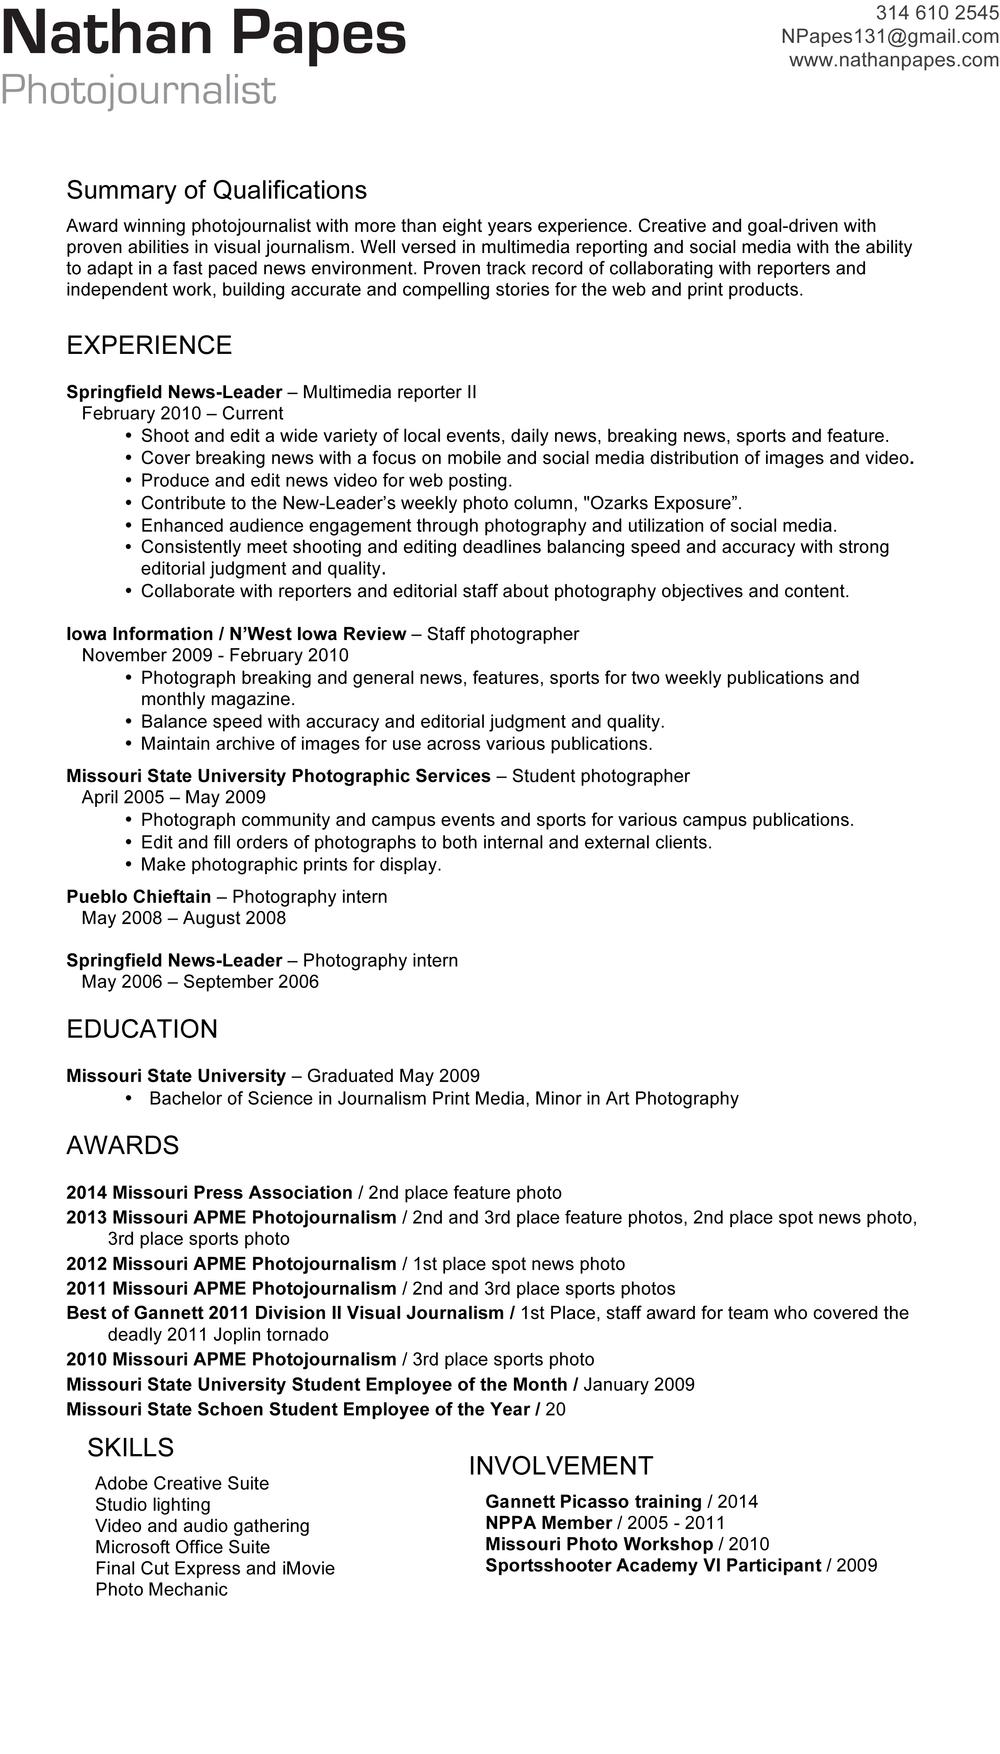 Microsoft Word - Resume.docx